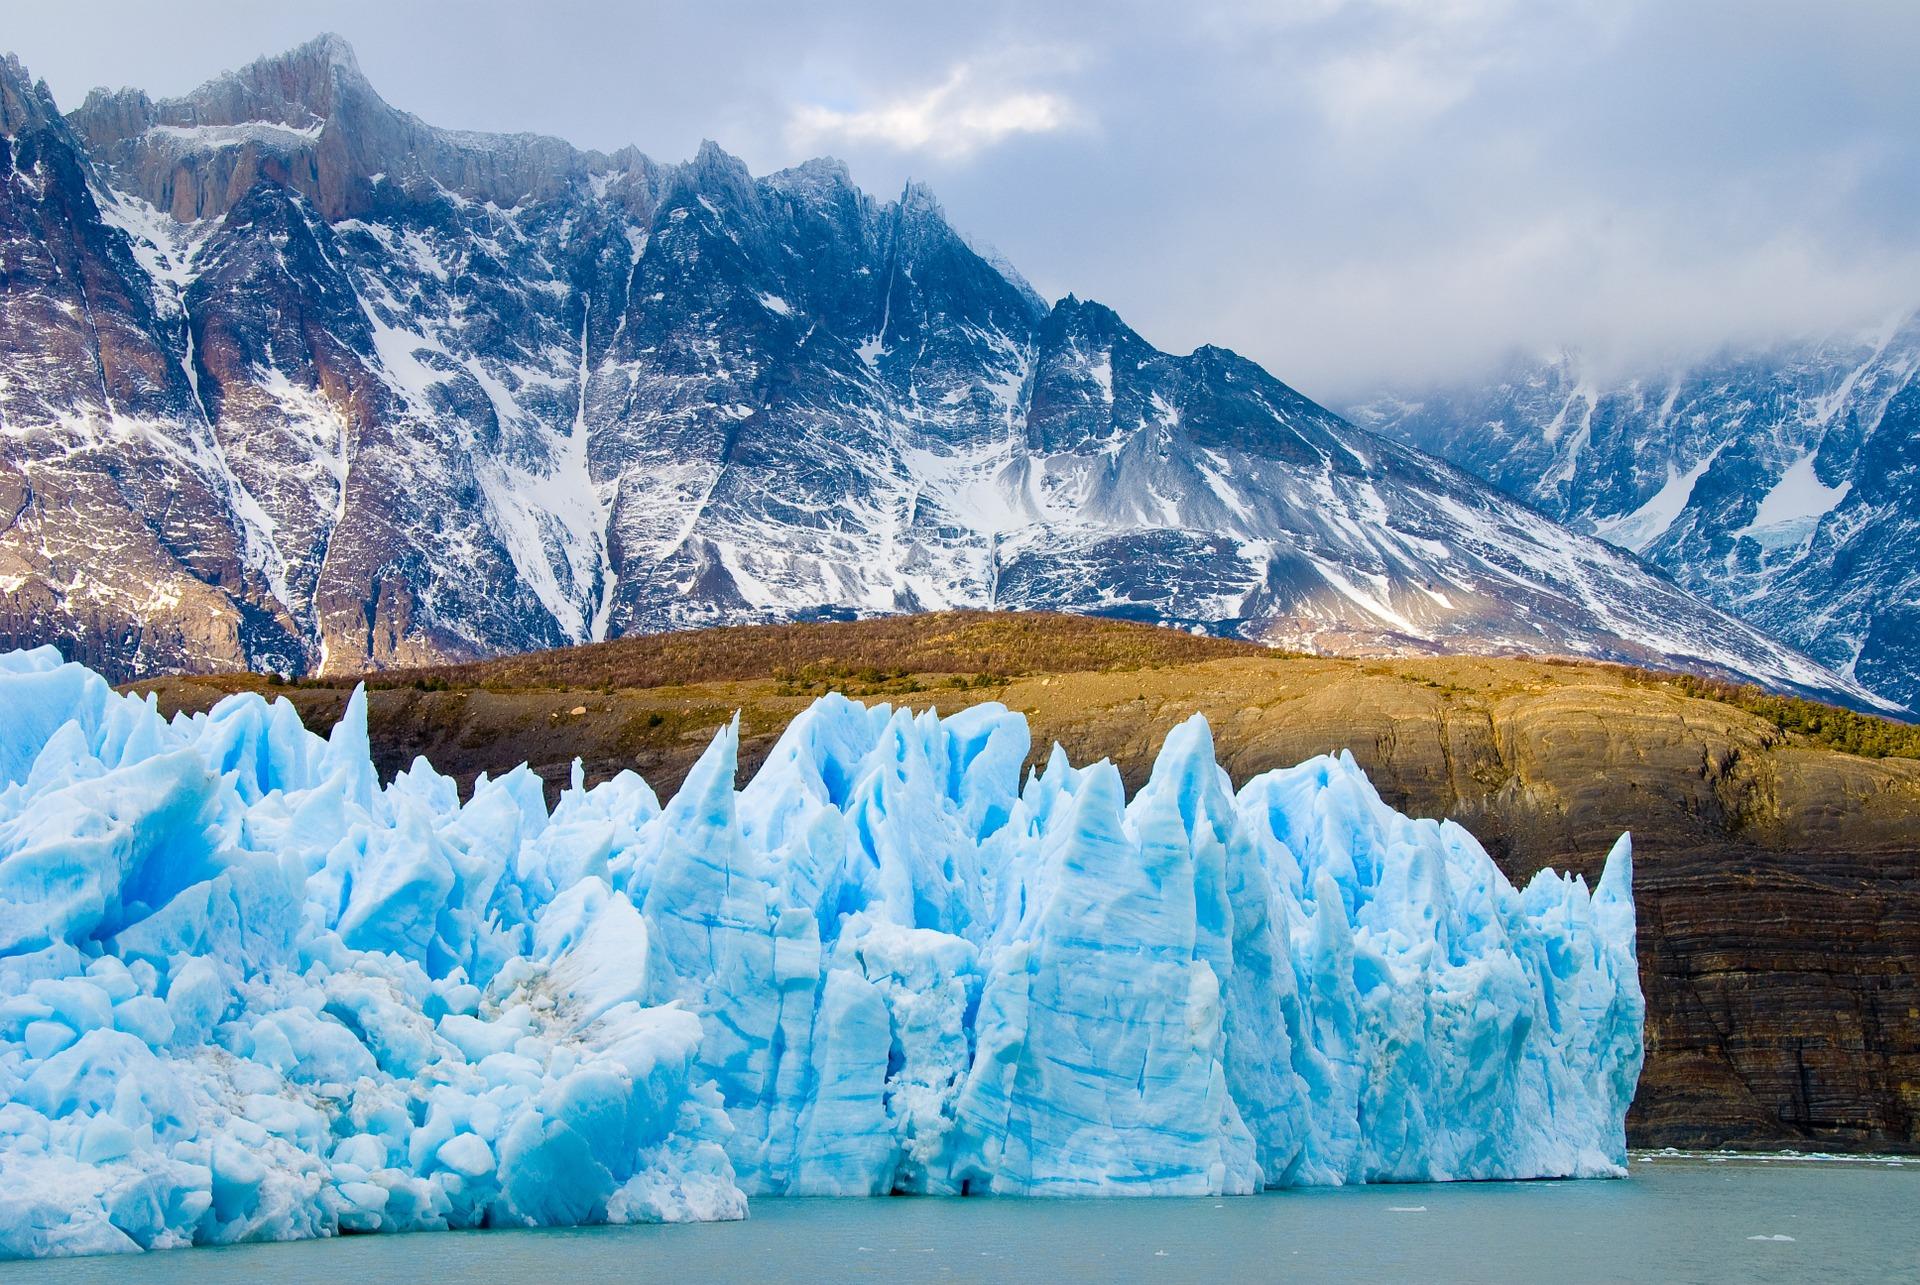 2. Patagonia -